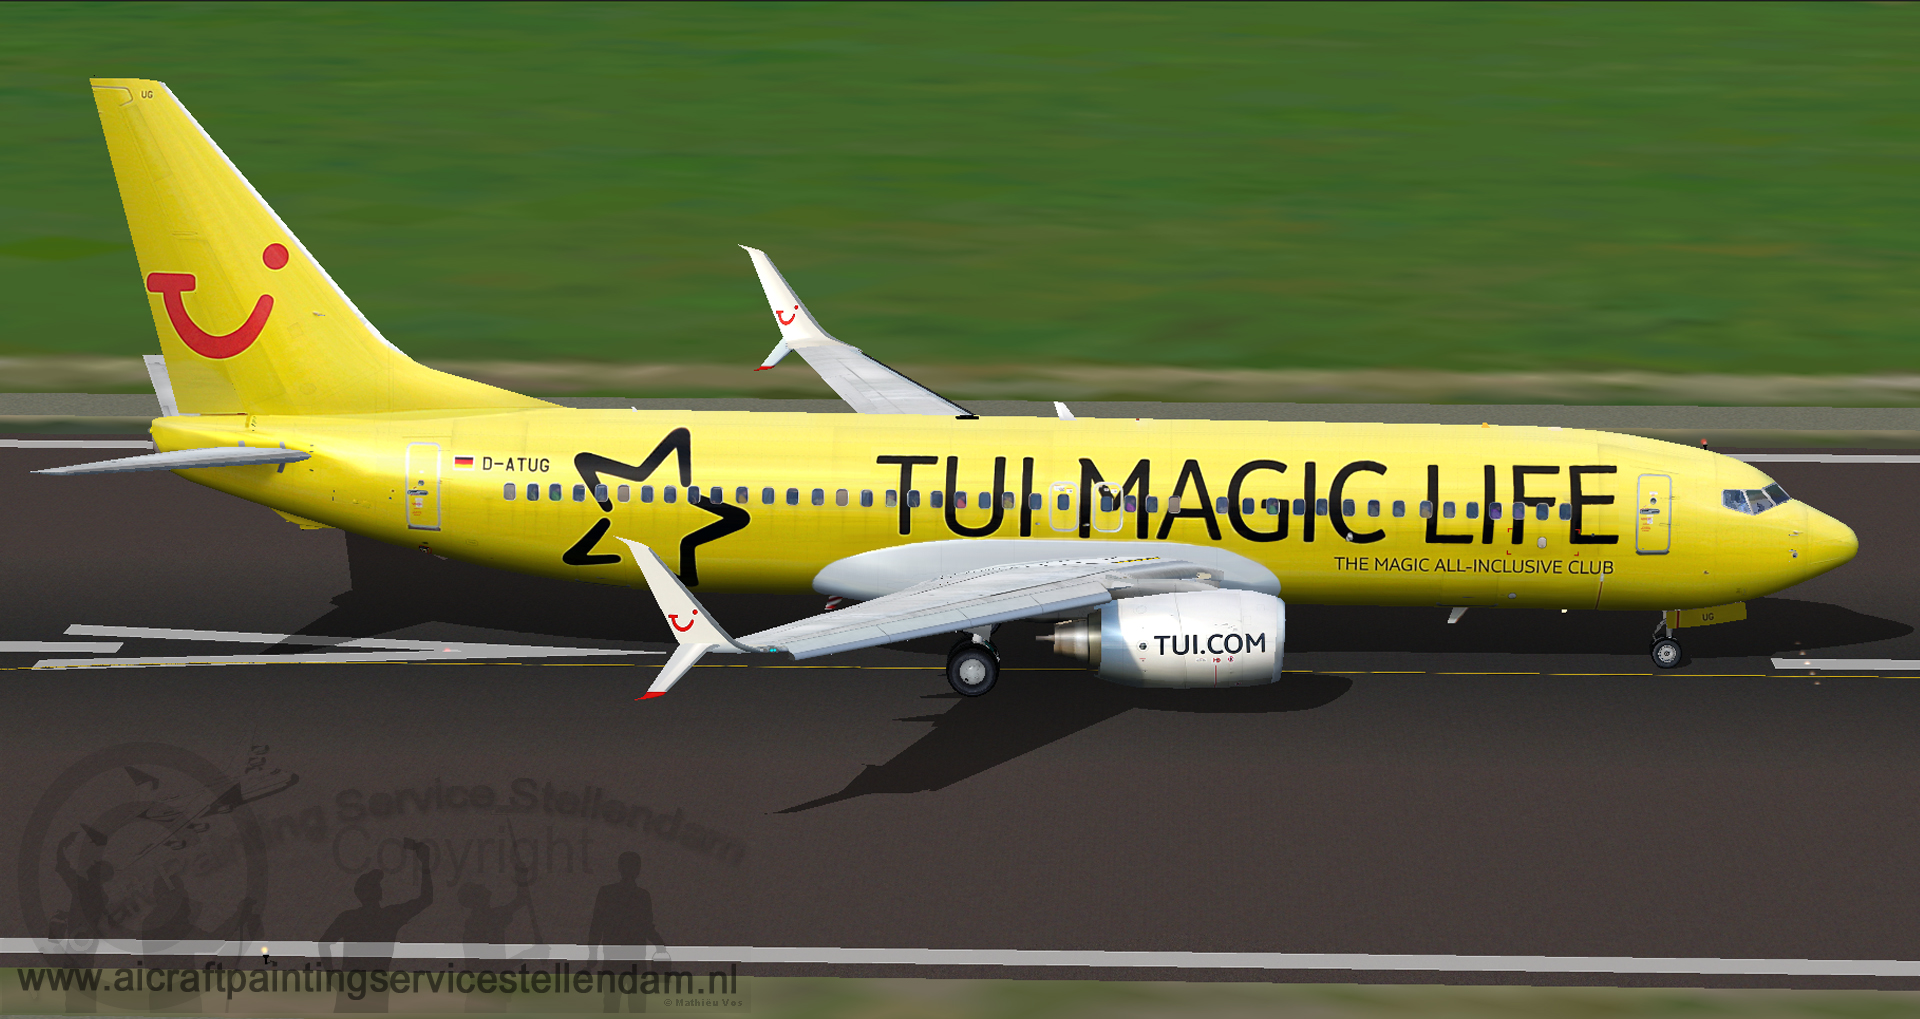 TDSB737-8K5_Tuifly_D-ATUG_TuiMagicLife2